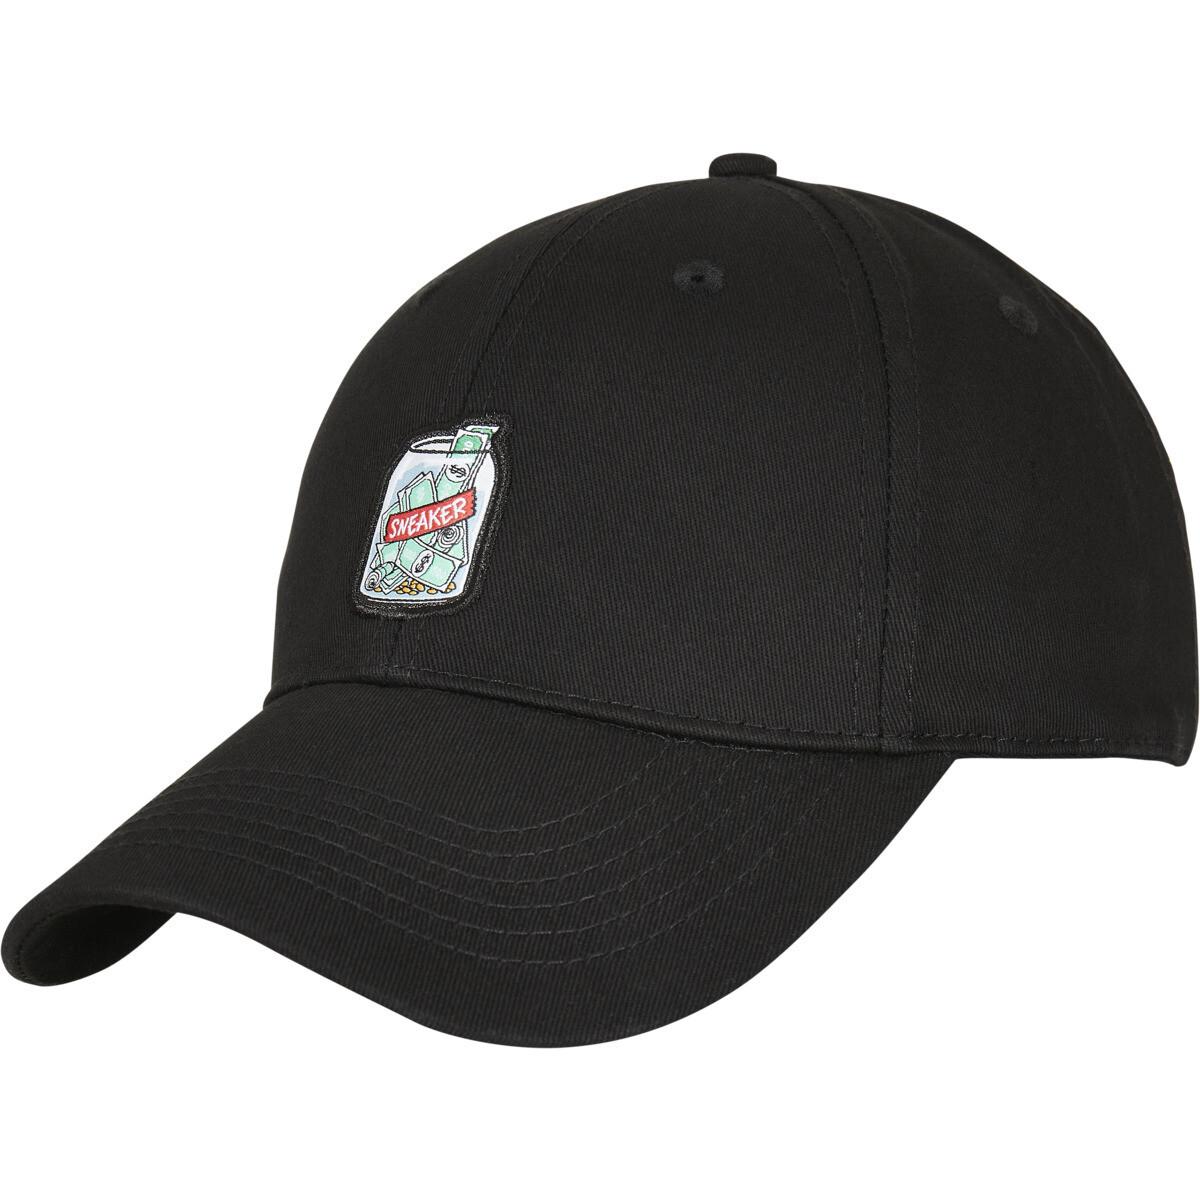 C&S WL Savings Curved Cap